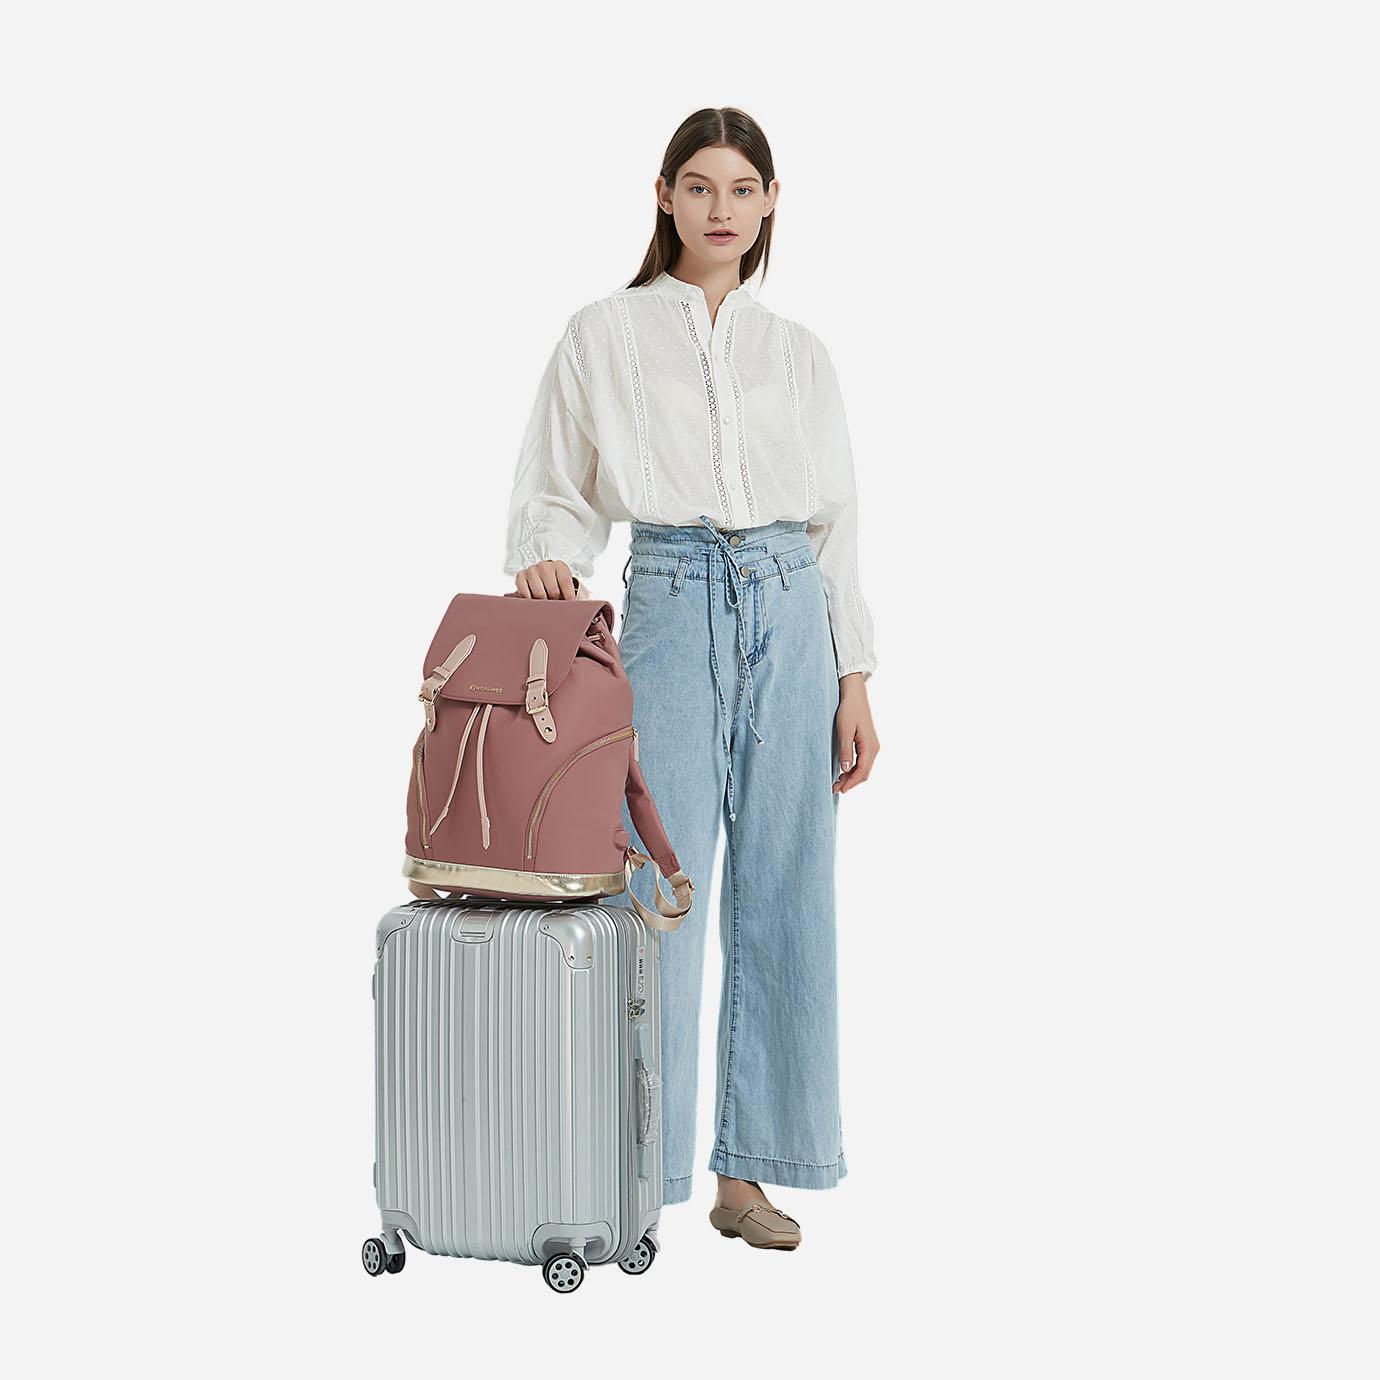 Nordace Eliz –旅行和日常使用的背包